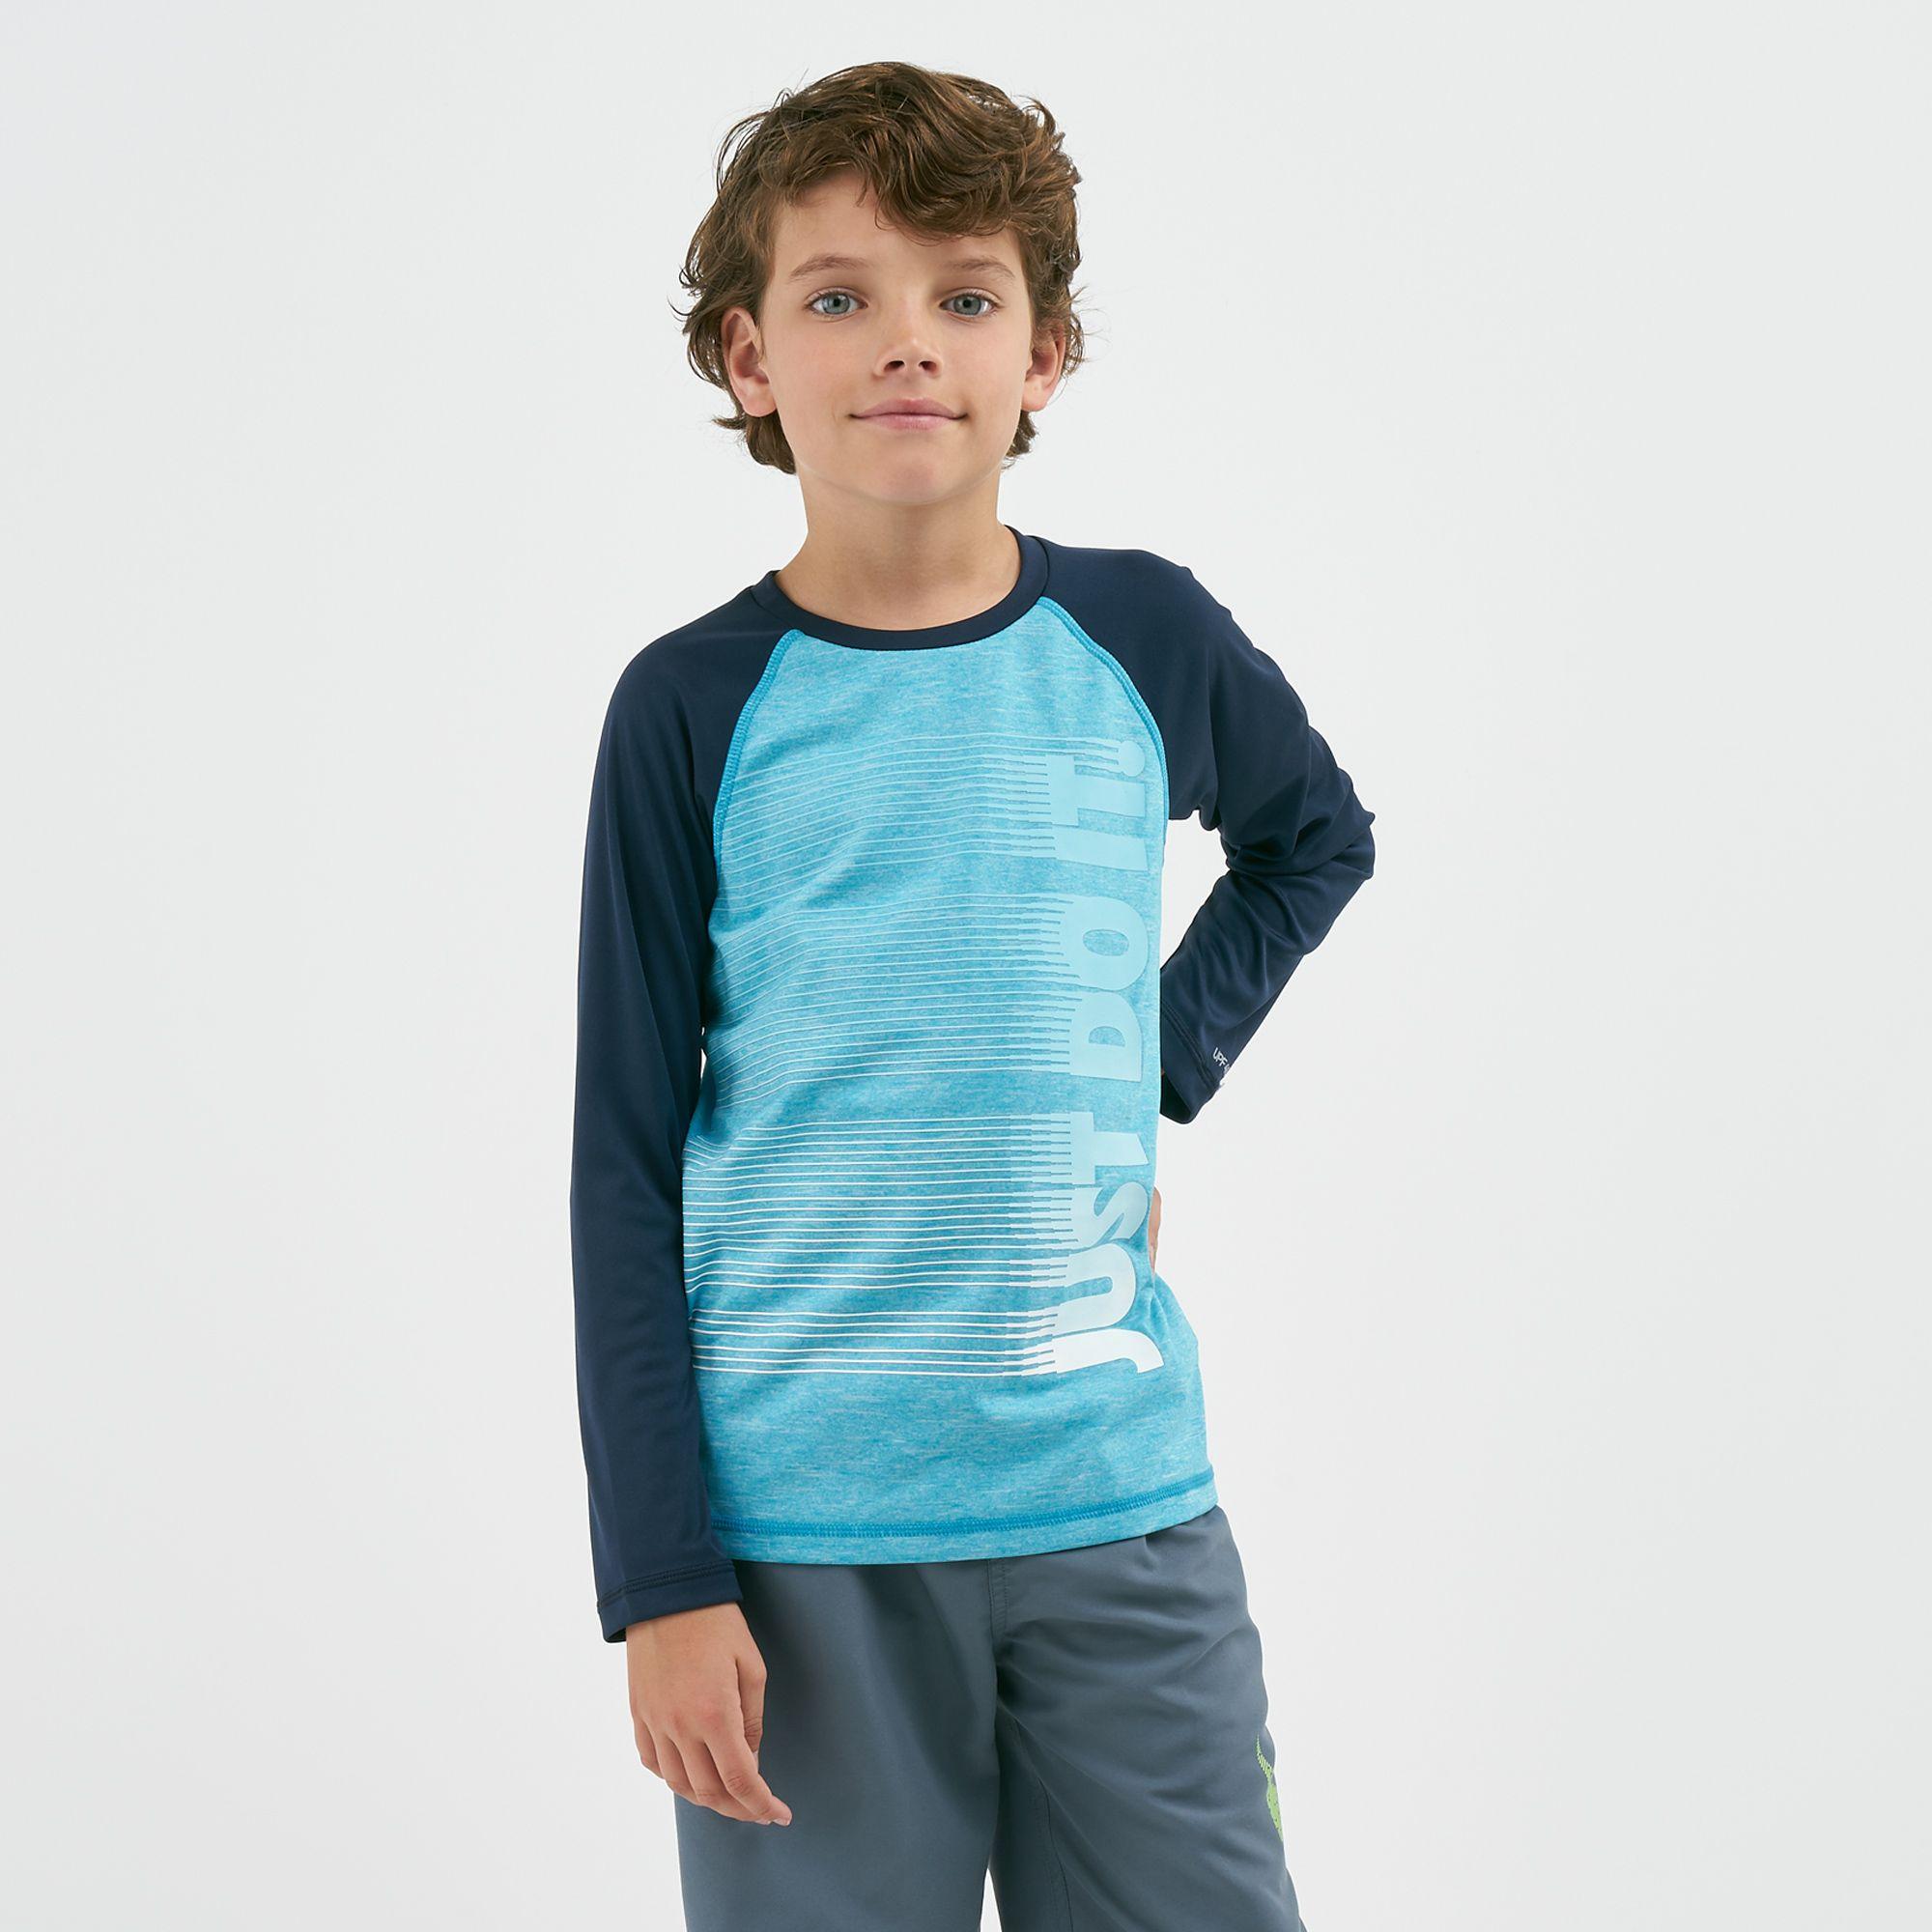 b5588199 Nike Kids' Heather JDI Long Sleeve T-Shirt (Older Kids)   Swimwear ...